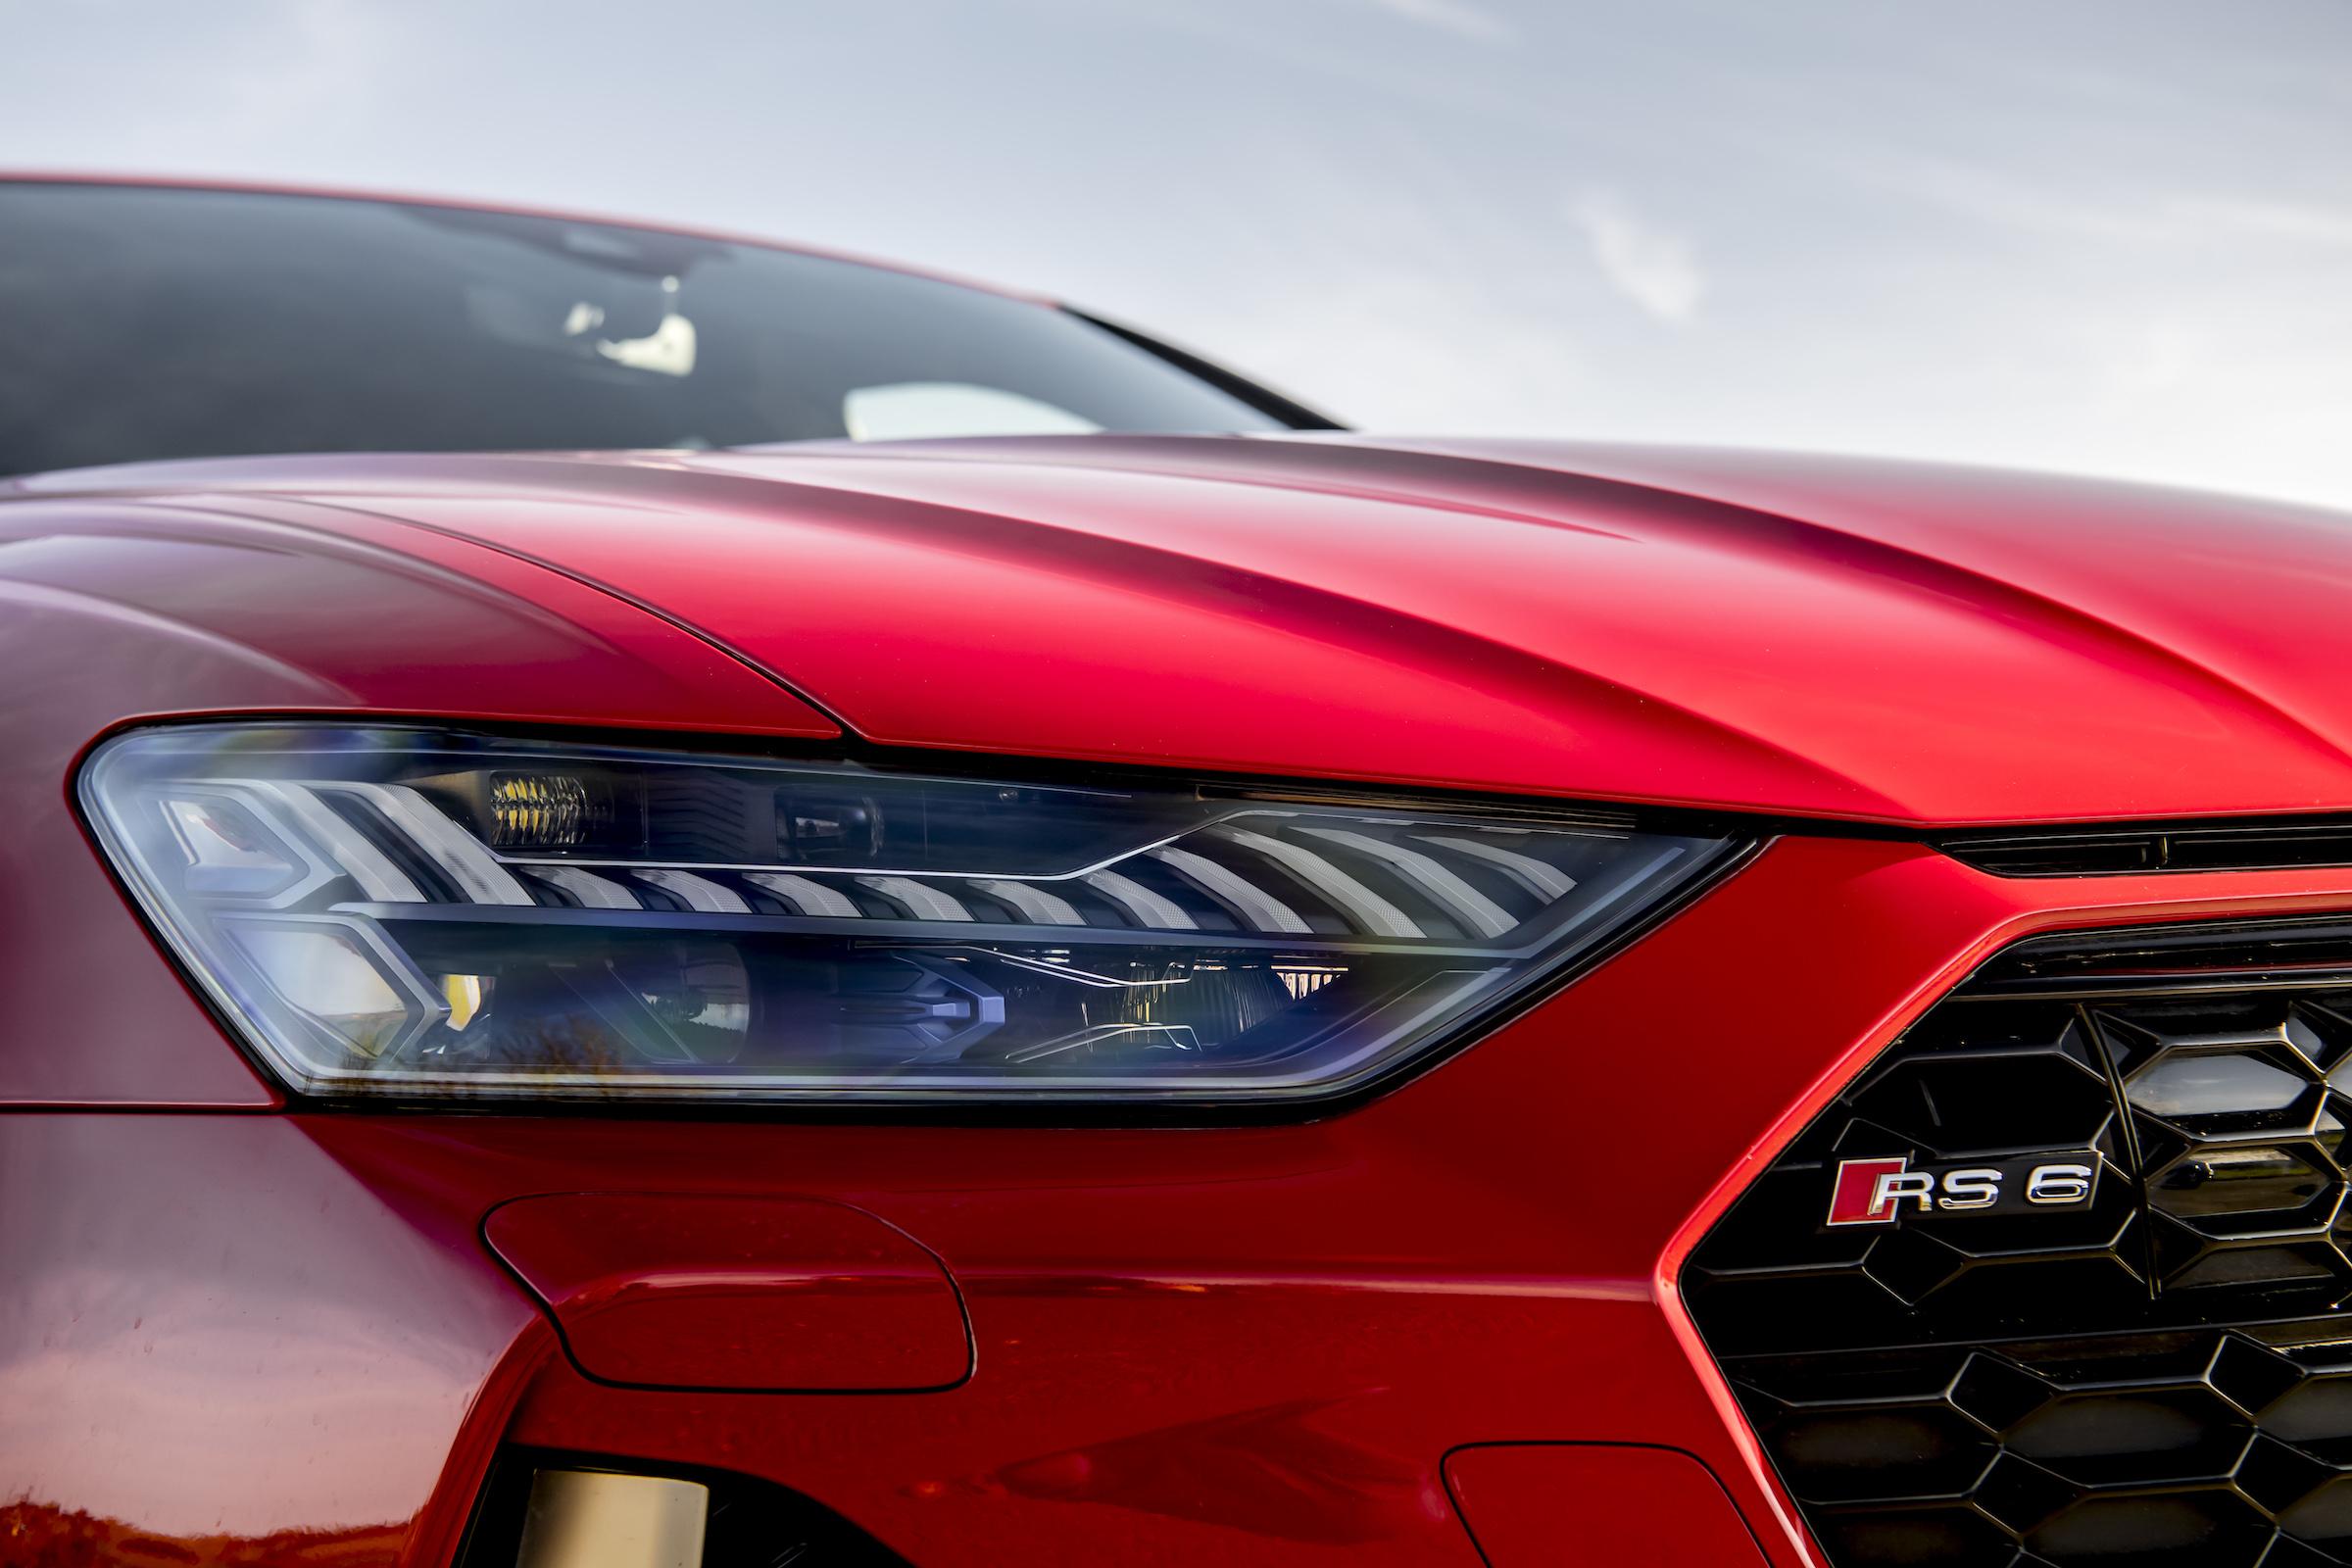 Audi RS6 front headlight